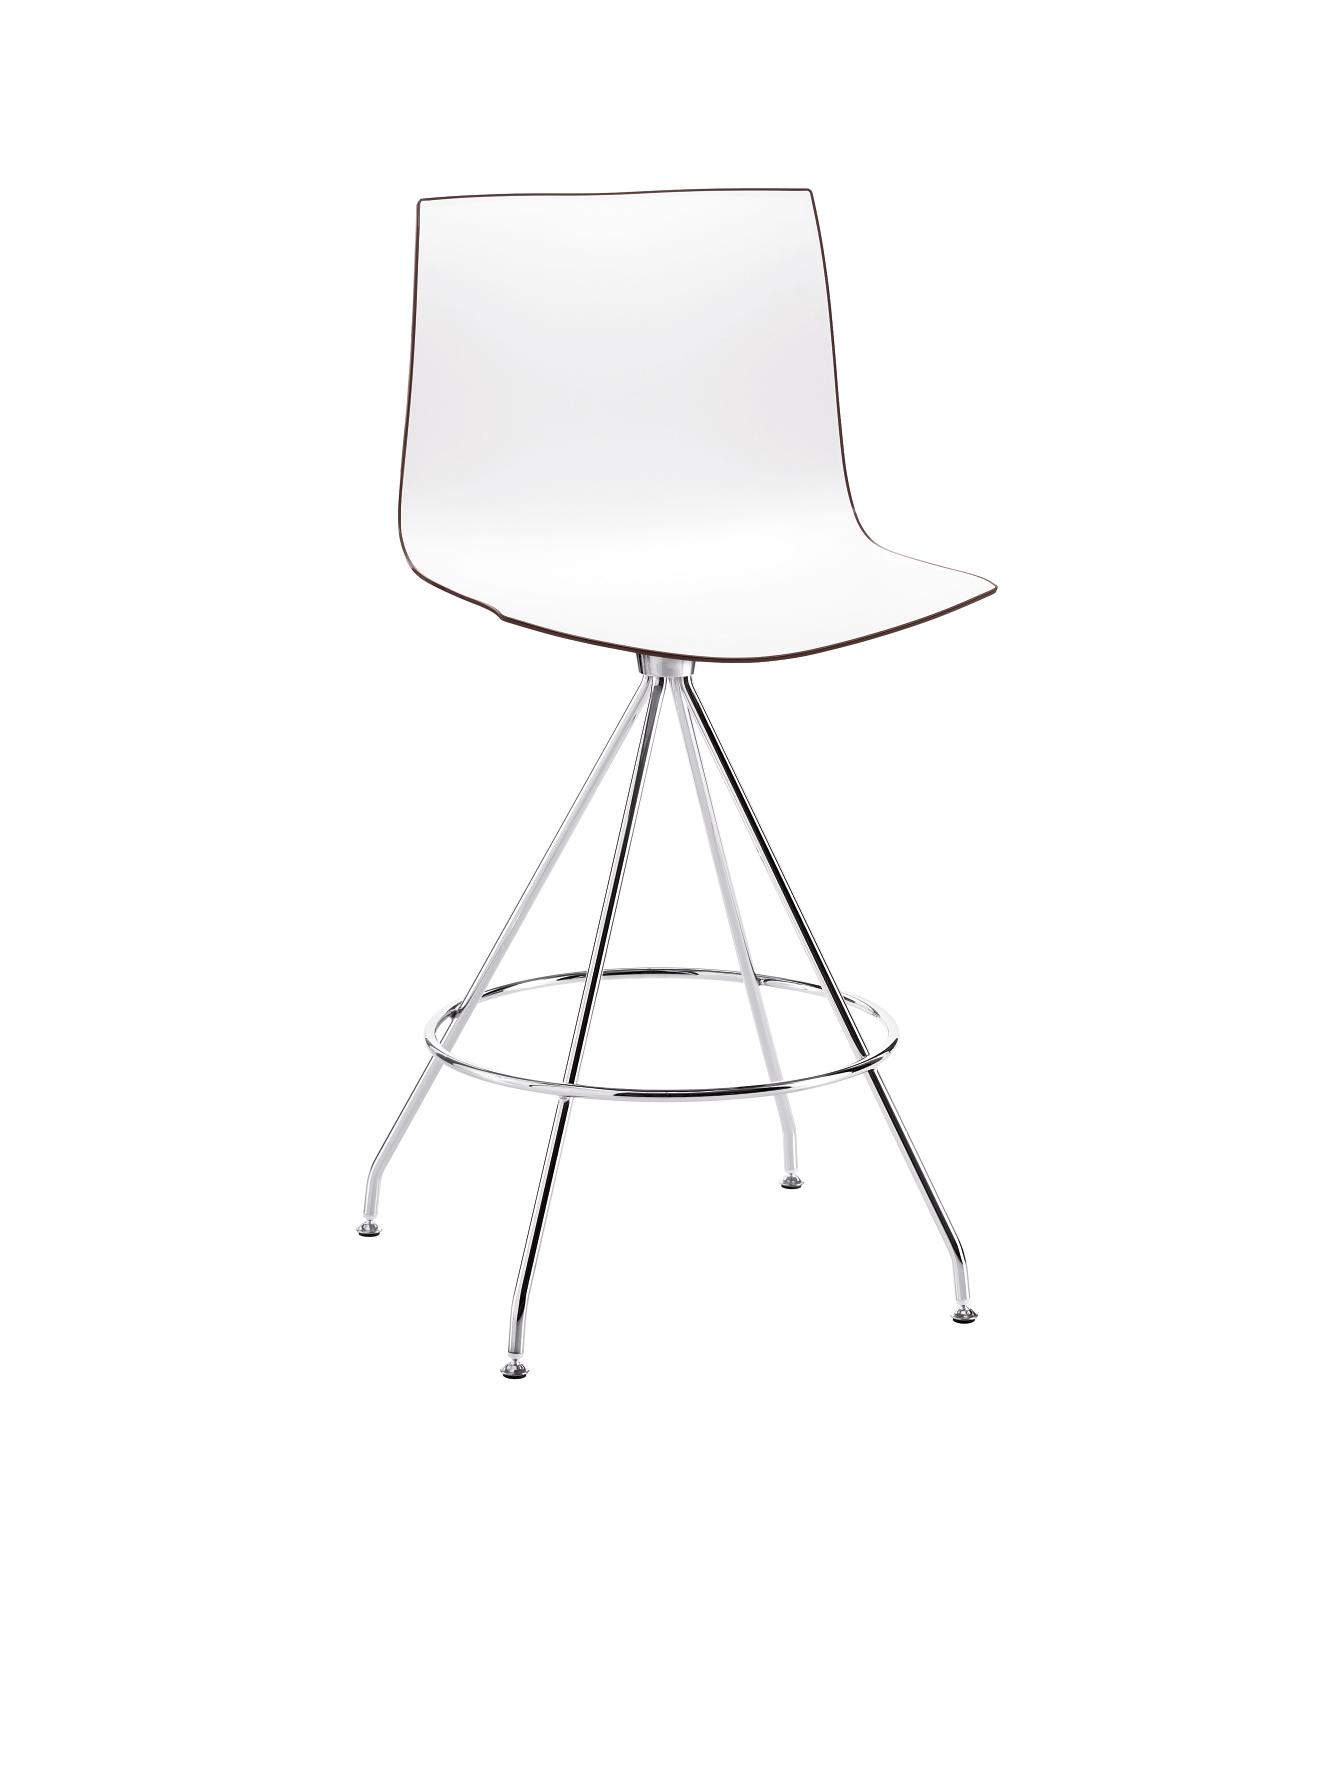 Catifa46 0488 chair by Arper